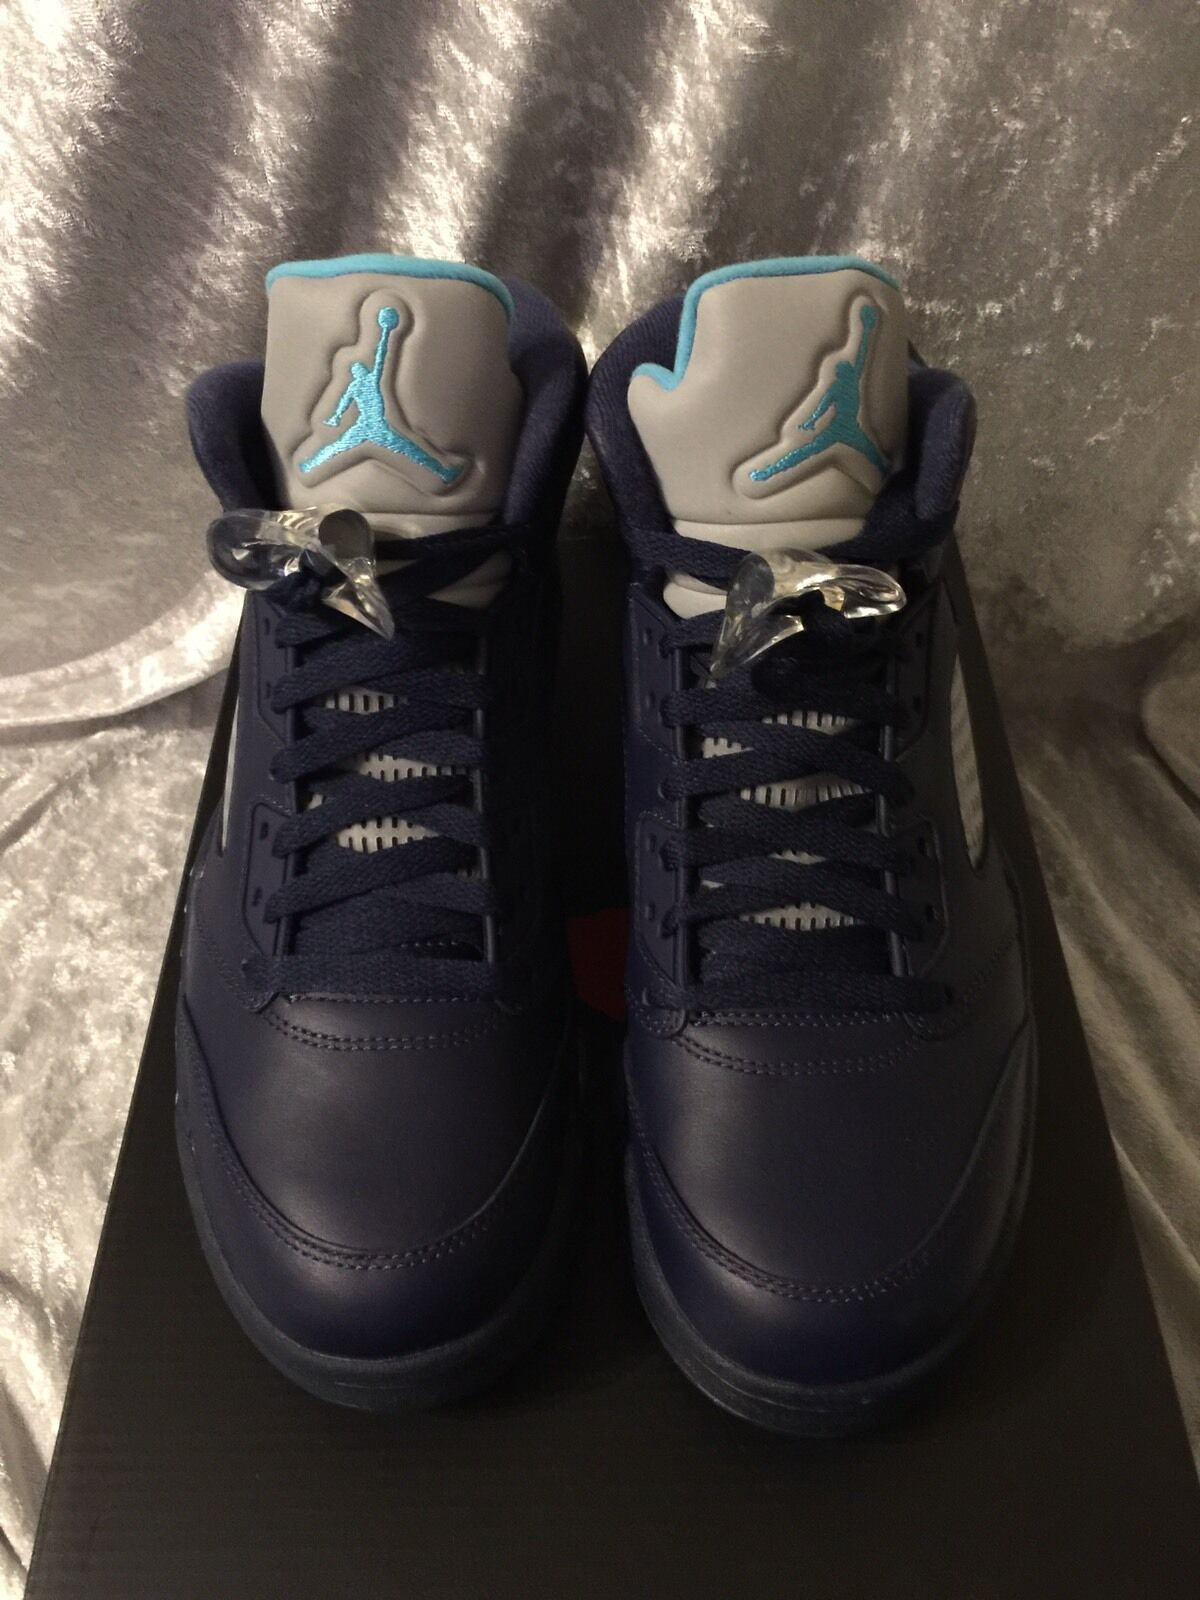 Nike Jordan 5 Retro Hornets Size 8.5